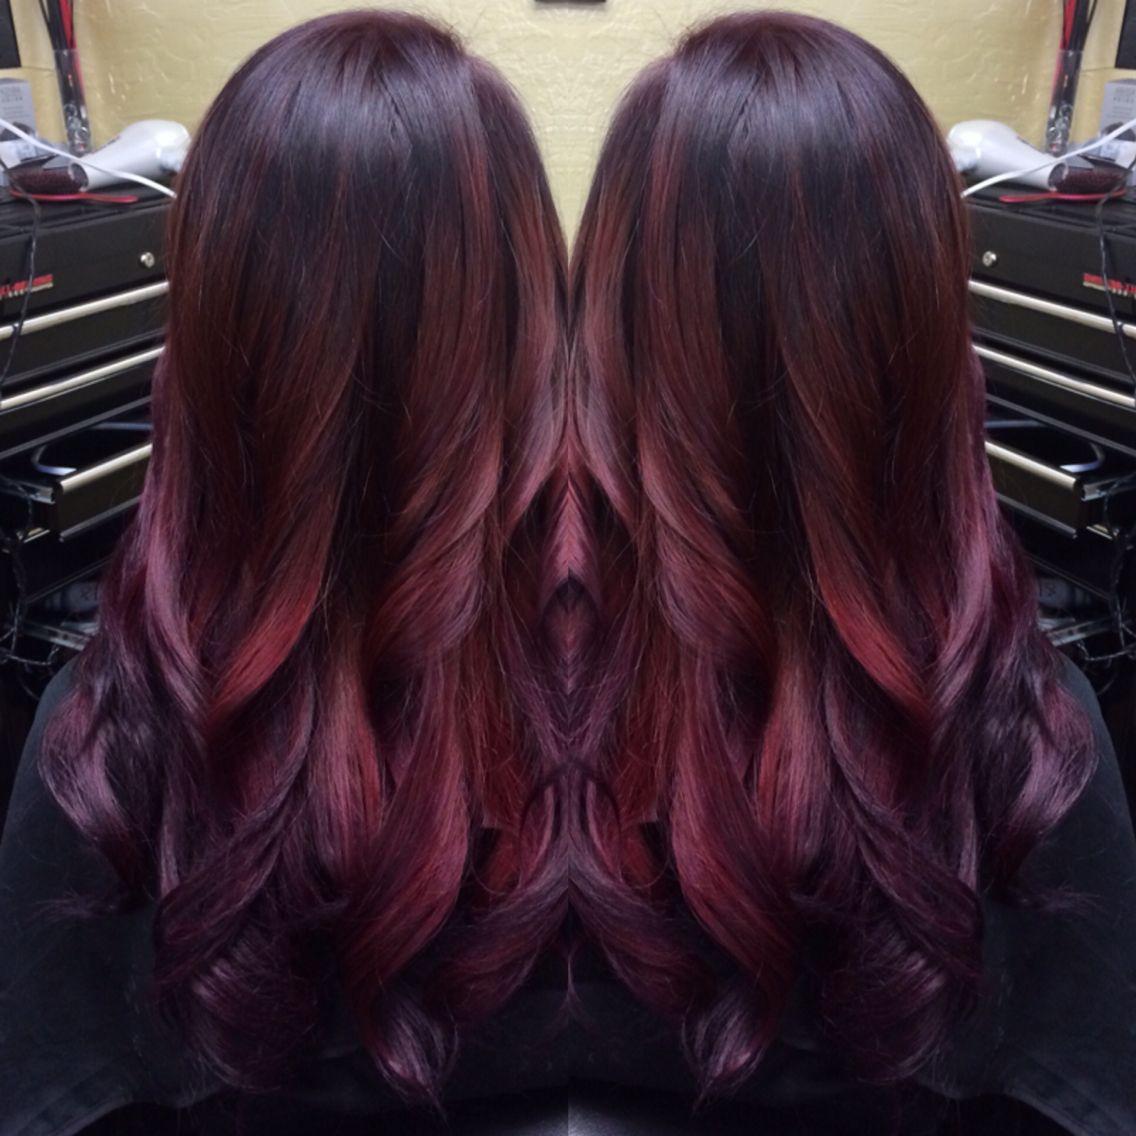 Merlot hair color - Hair Cuts Merlot Balayage